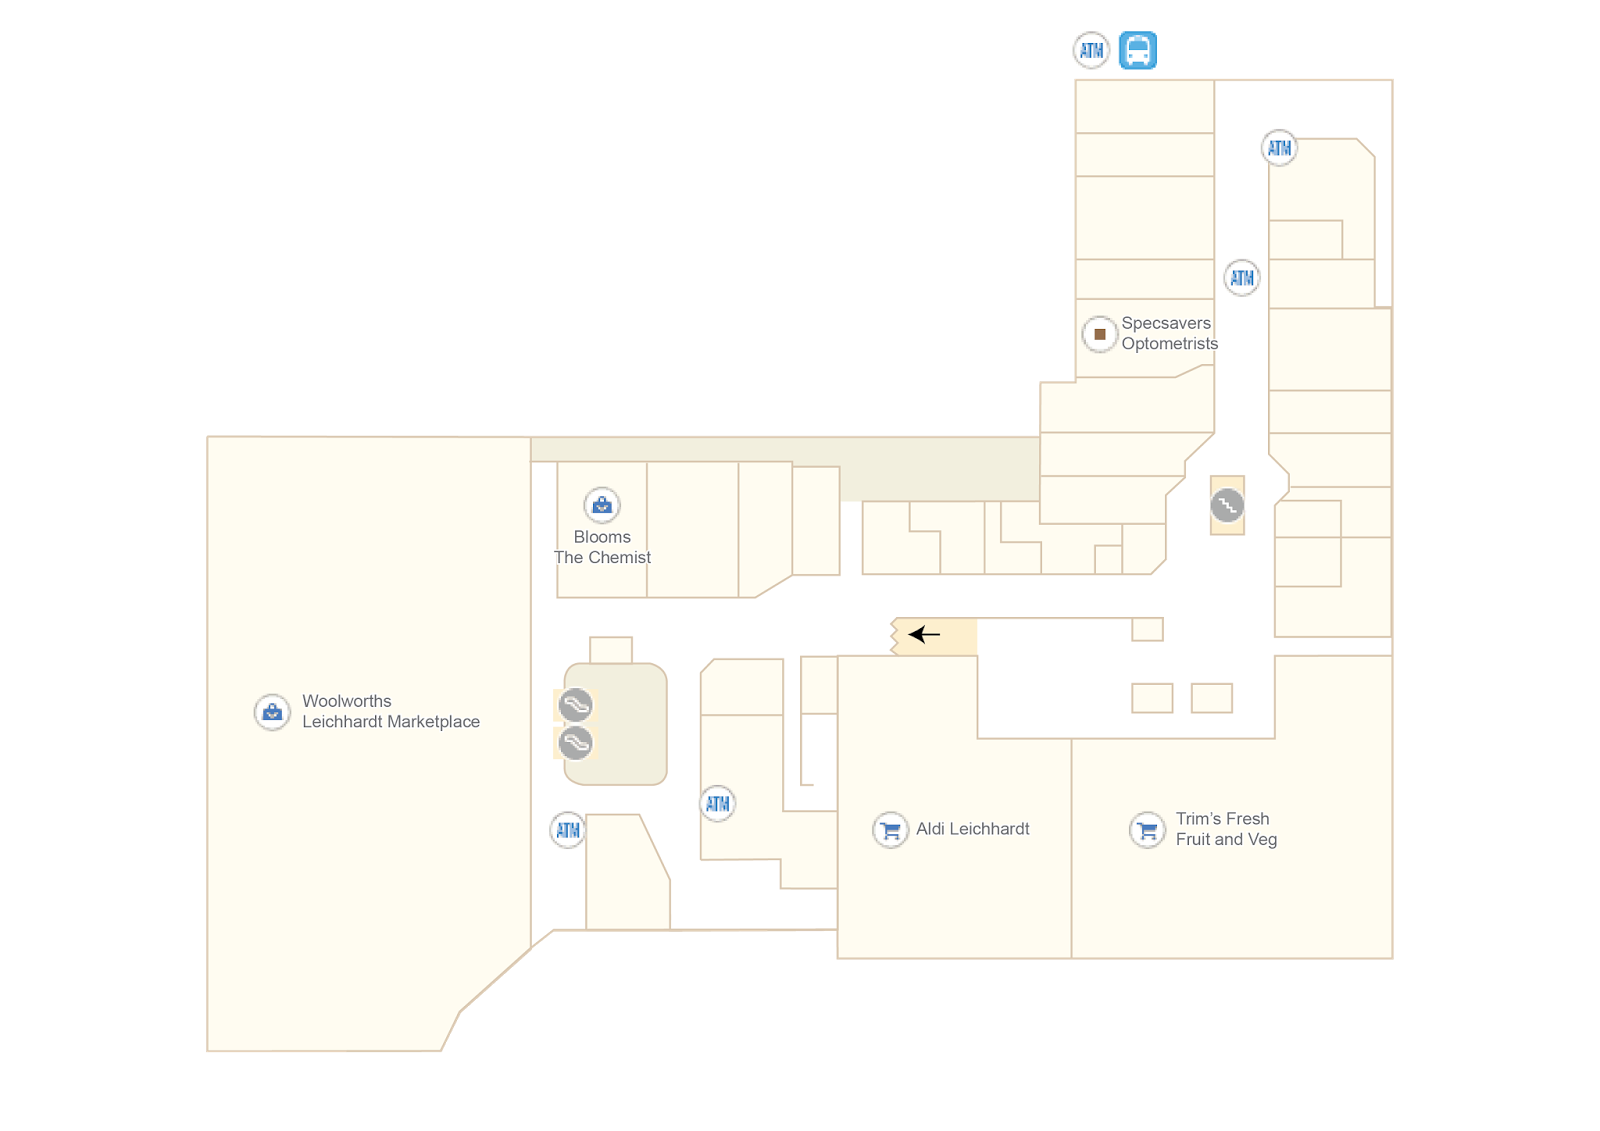 Floor Plans Submission - Google Maps Help on online maps, amazon fire phone maps, microsoft maps, waze maps, aeronautical maps, topographic maps, googie maps, ipad maps, stanford university maps, gppgle maps, road map usa states maps, aerial maps, android maps, googlr maps, goolge maps, iphone maps, search maps, bing maps, gogole maps, msn maps,